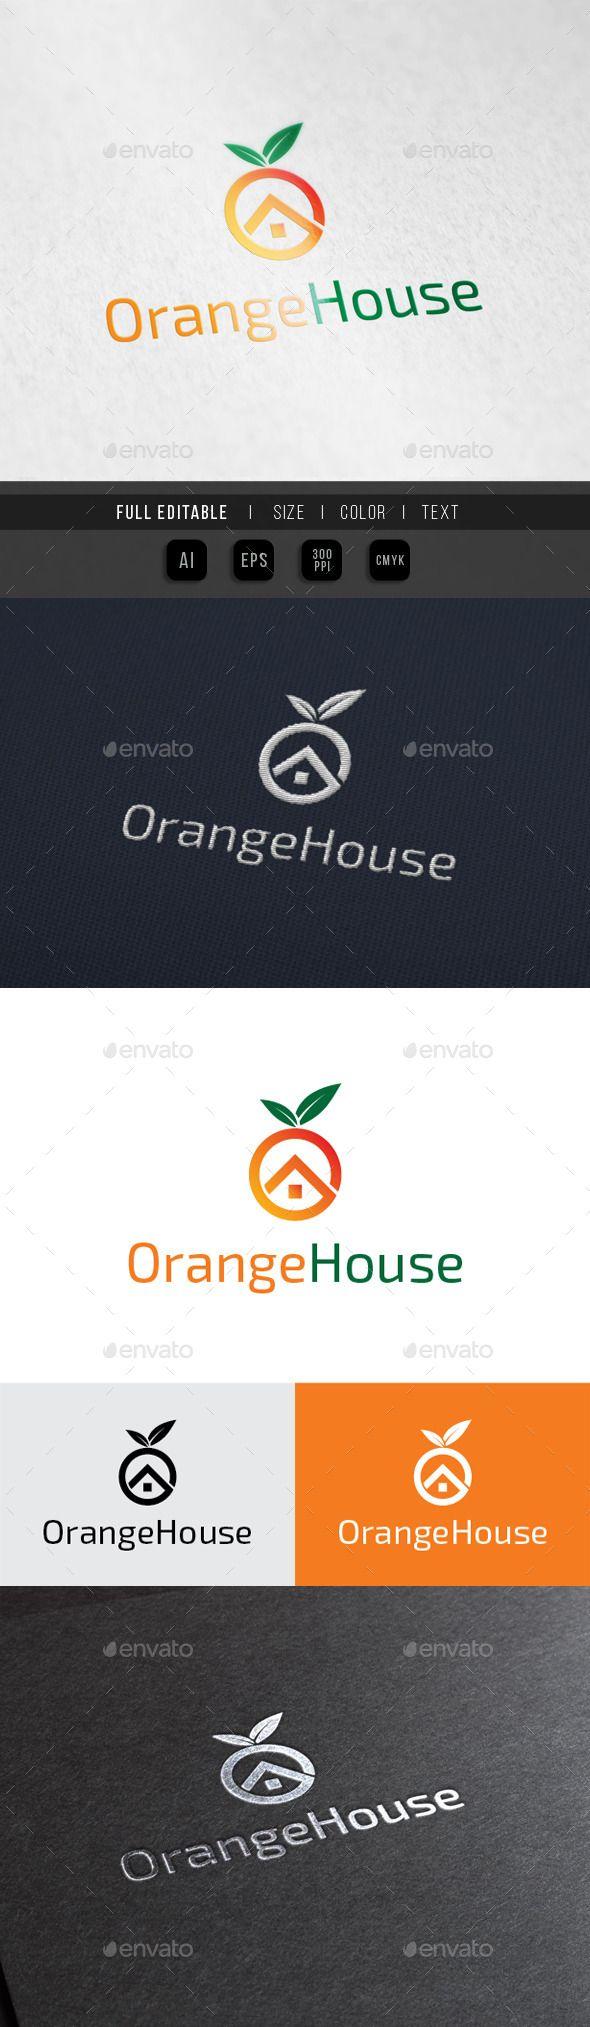 Orange House Fruit Juice shop Logo Design Template Vector #logotype Download it here:  http://graphicriver.net/item/orange-house-fruit-juice-shop/10023208?s_rank=1489?ref=nesto